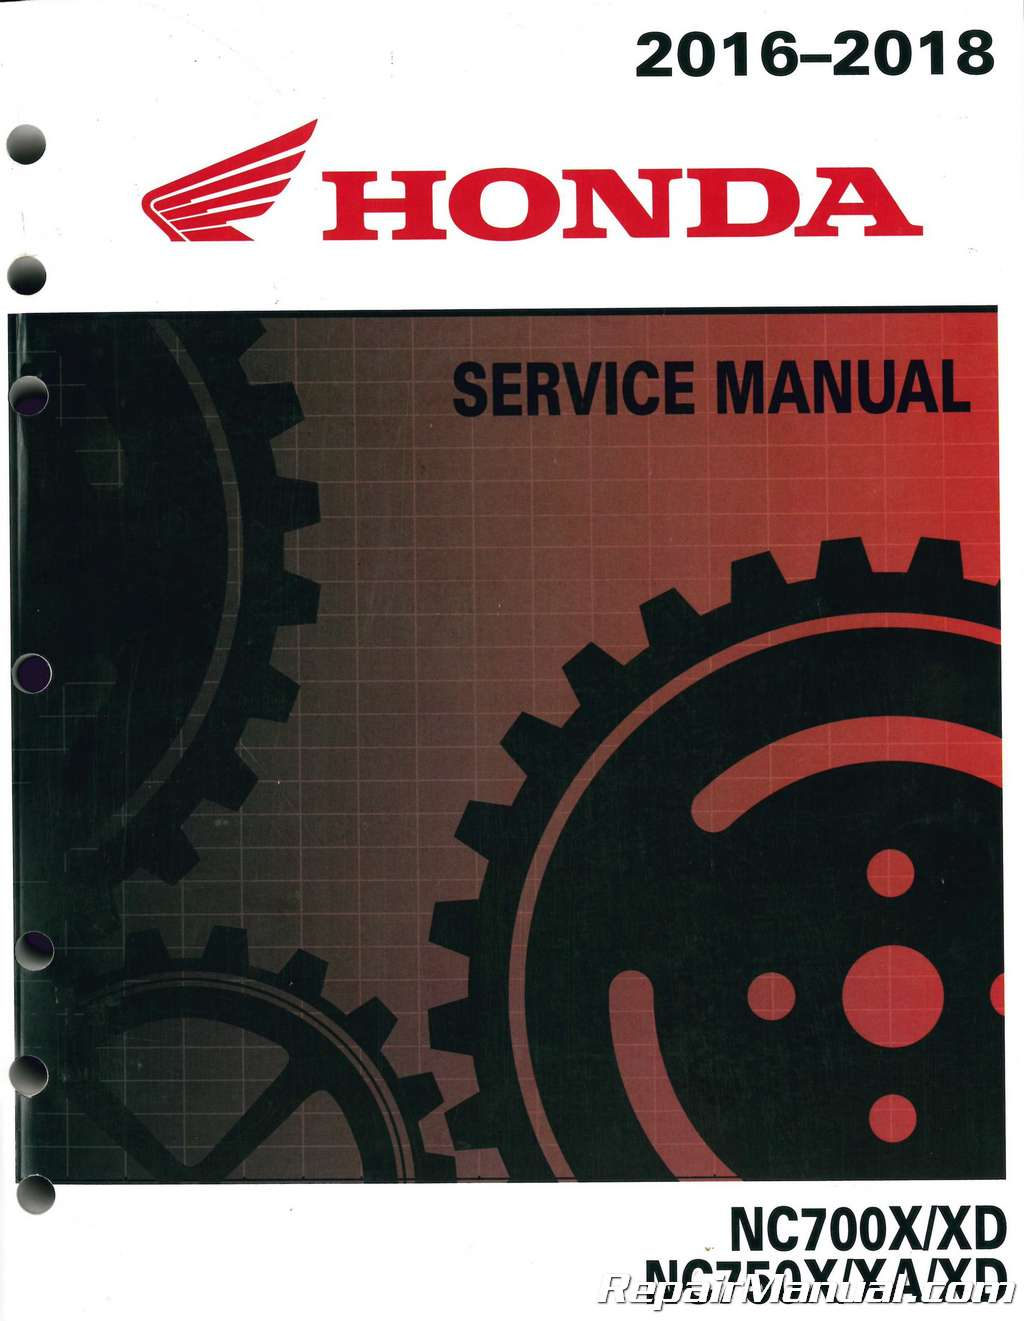 Honda Nc700x Wiring Diagram 2016 2018 Nc700x Xd Nc750x Xa Xd Motorcycle Service Manual